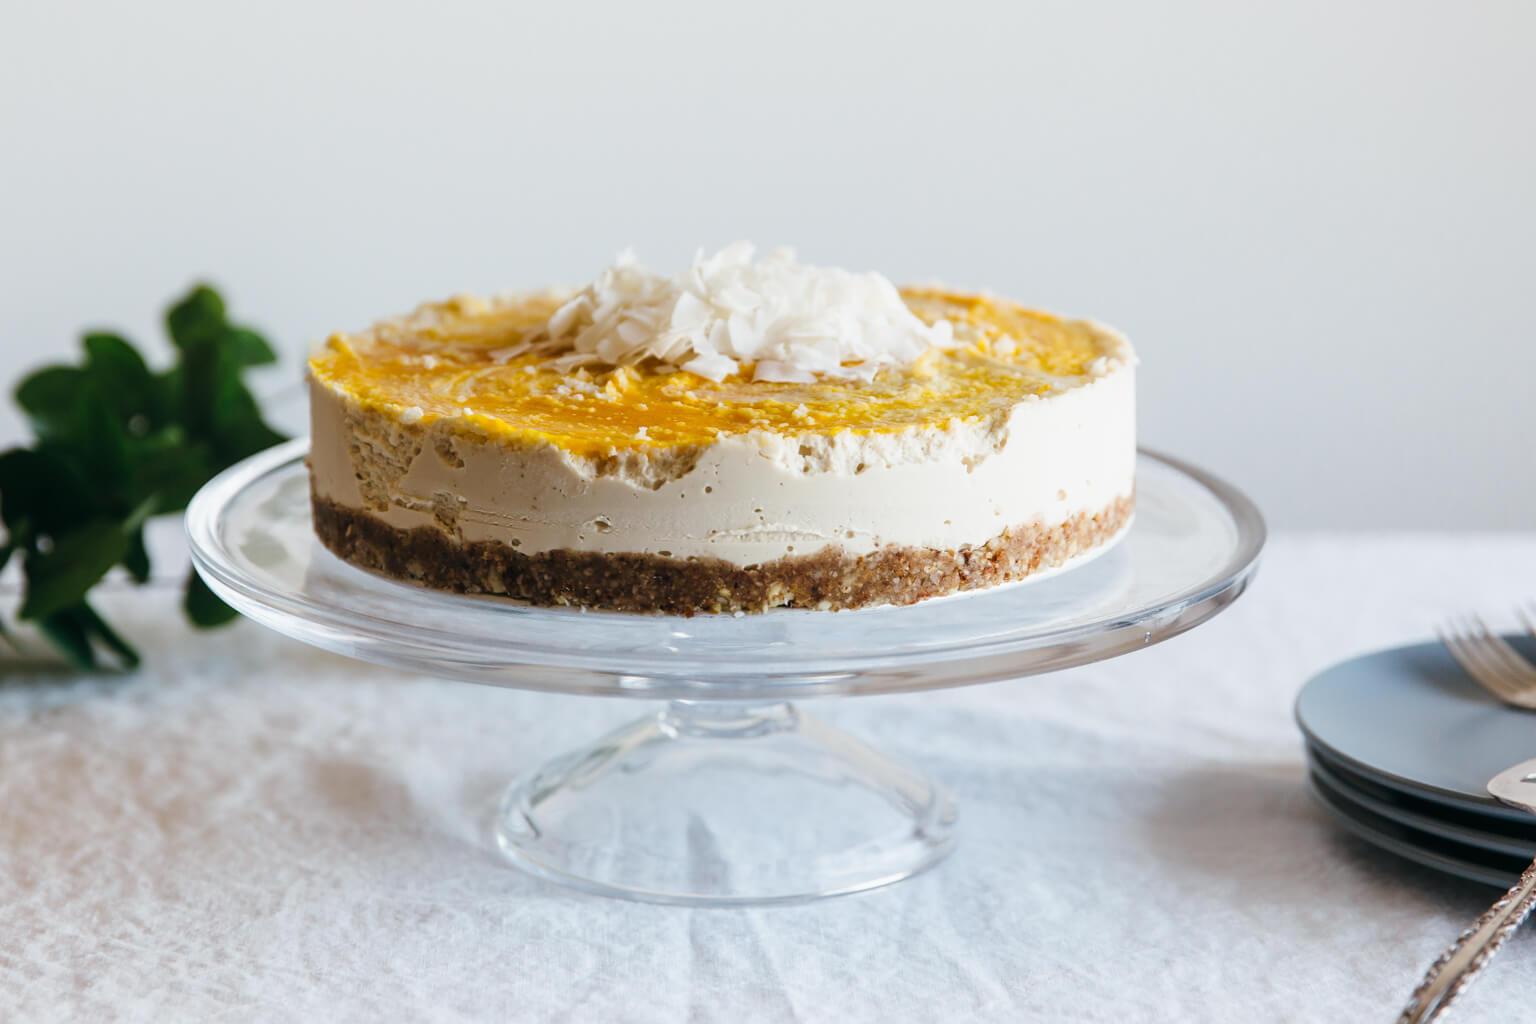 Top 20 Healthy Wedding Cake Ideas